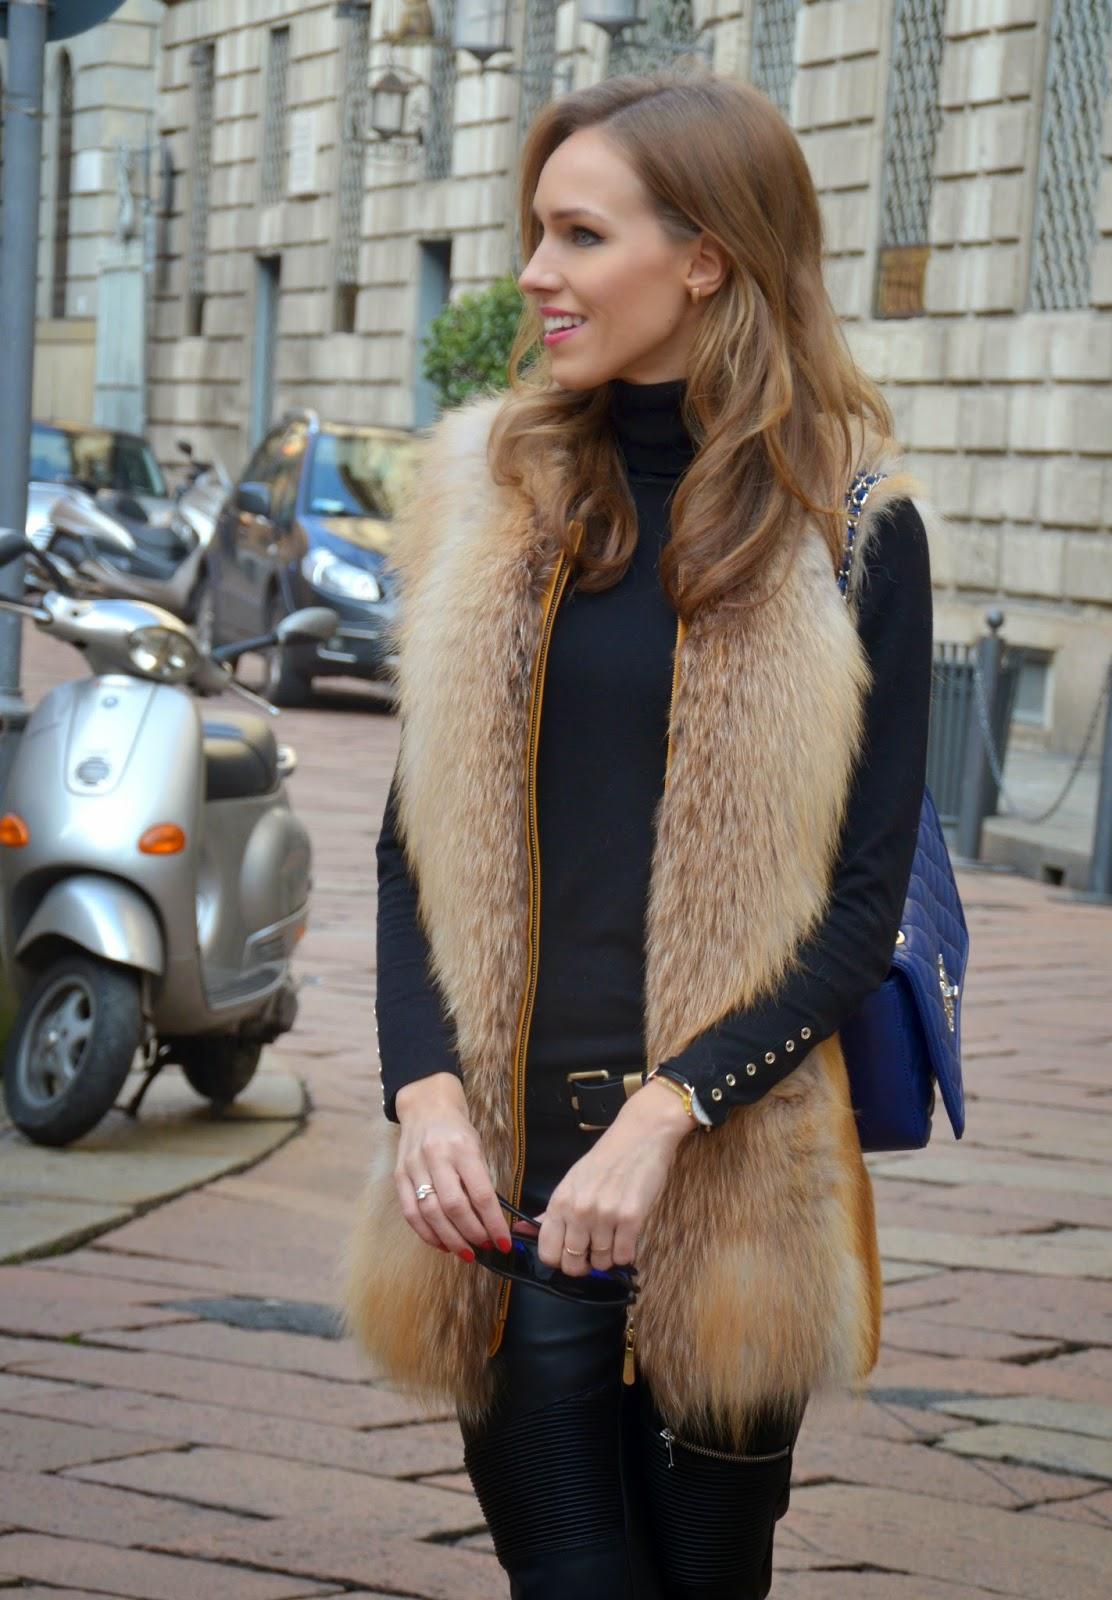 red-fox-fur-vest-zara-black-pullover-leather-pants-outfit-milan kristjaana mere